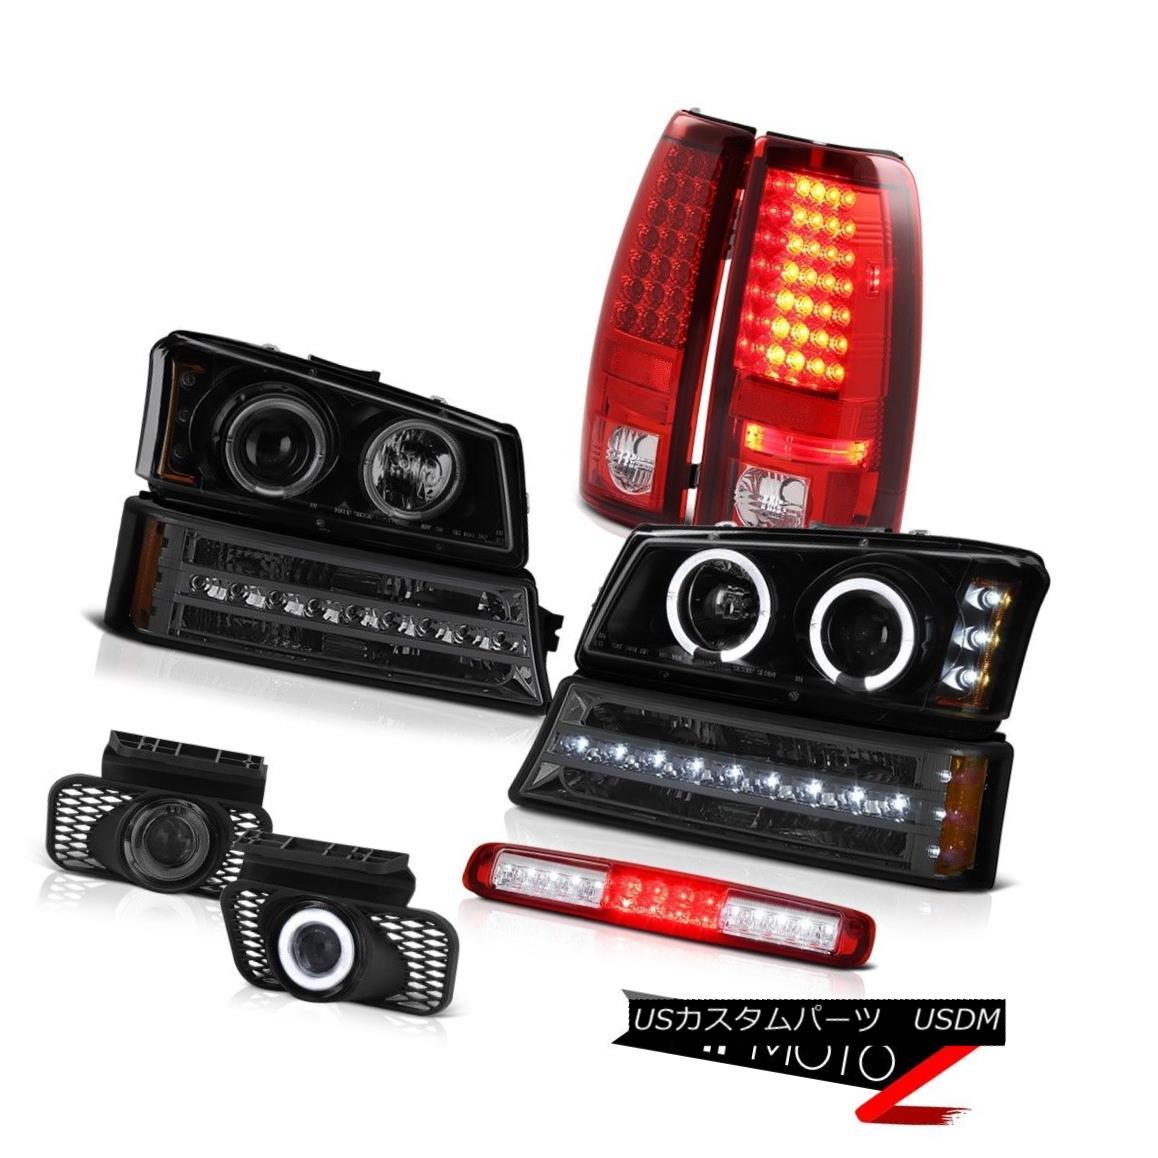 2Ps For Nissan Juke F15 18-SMD LED Error Free  Side Light Upgrade Parking Bulbs